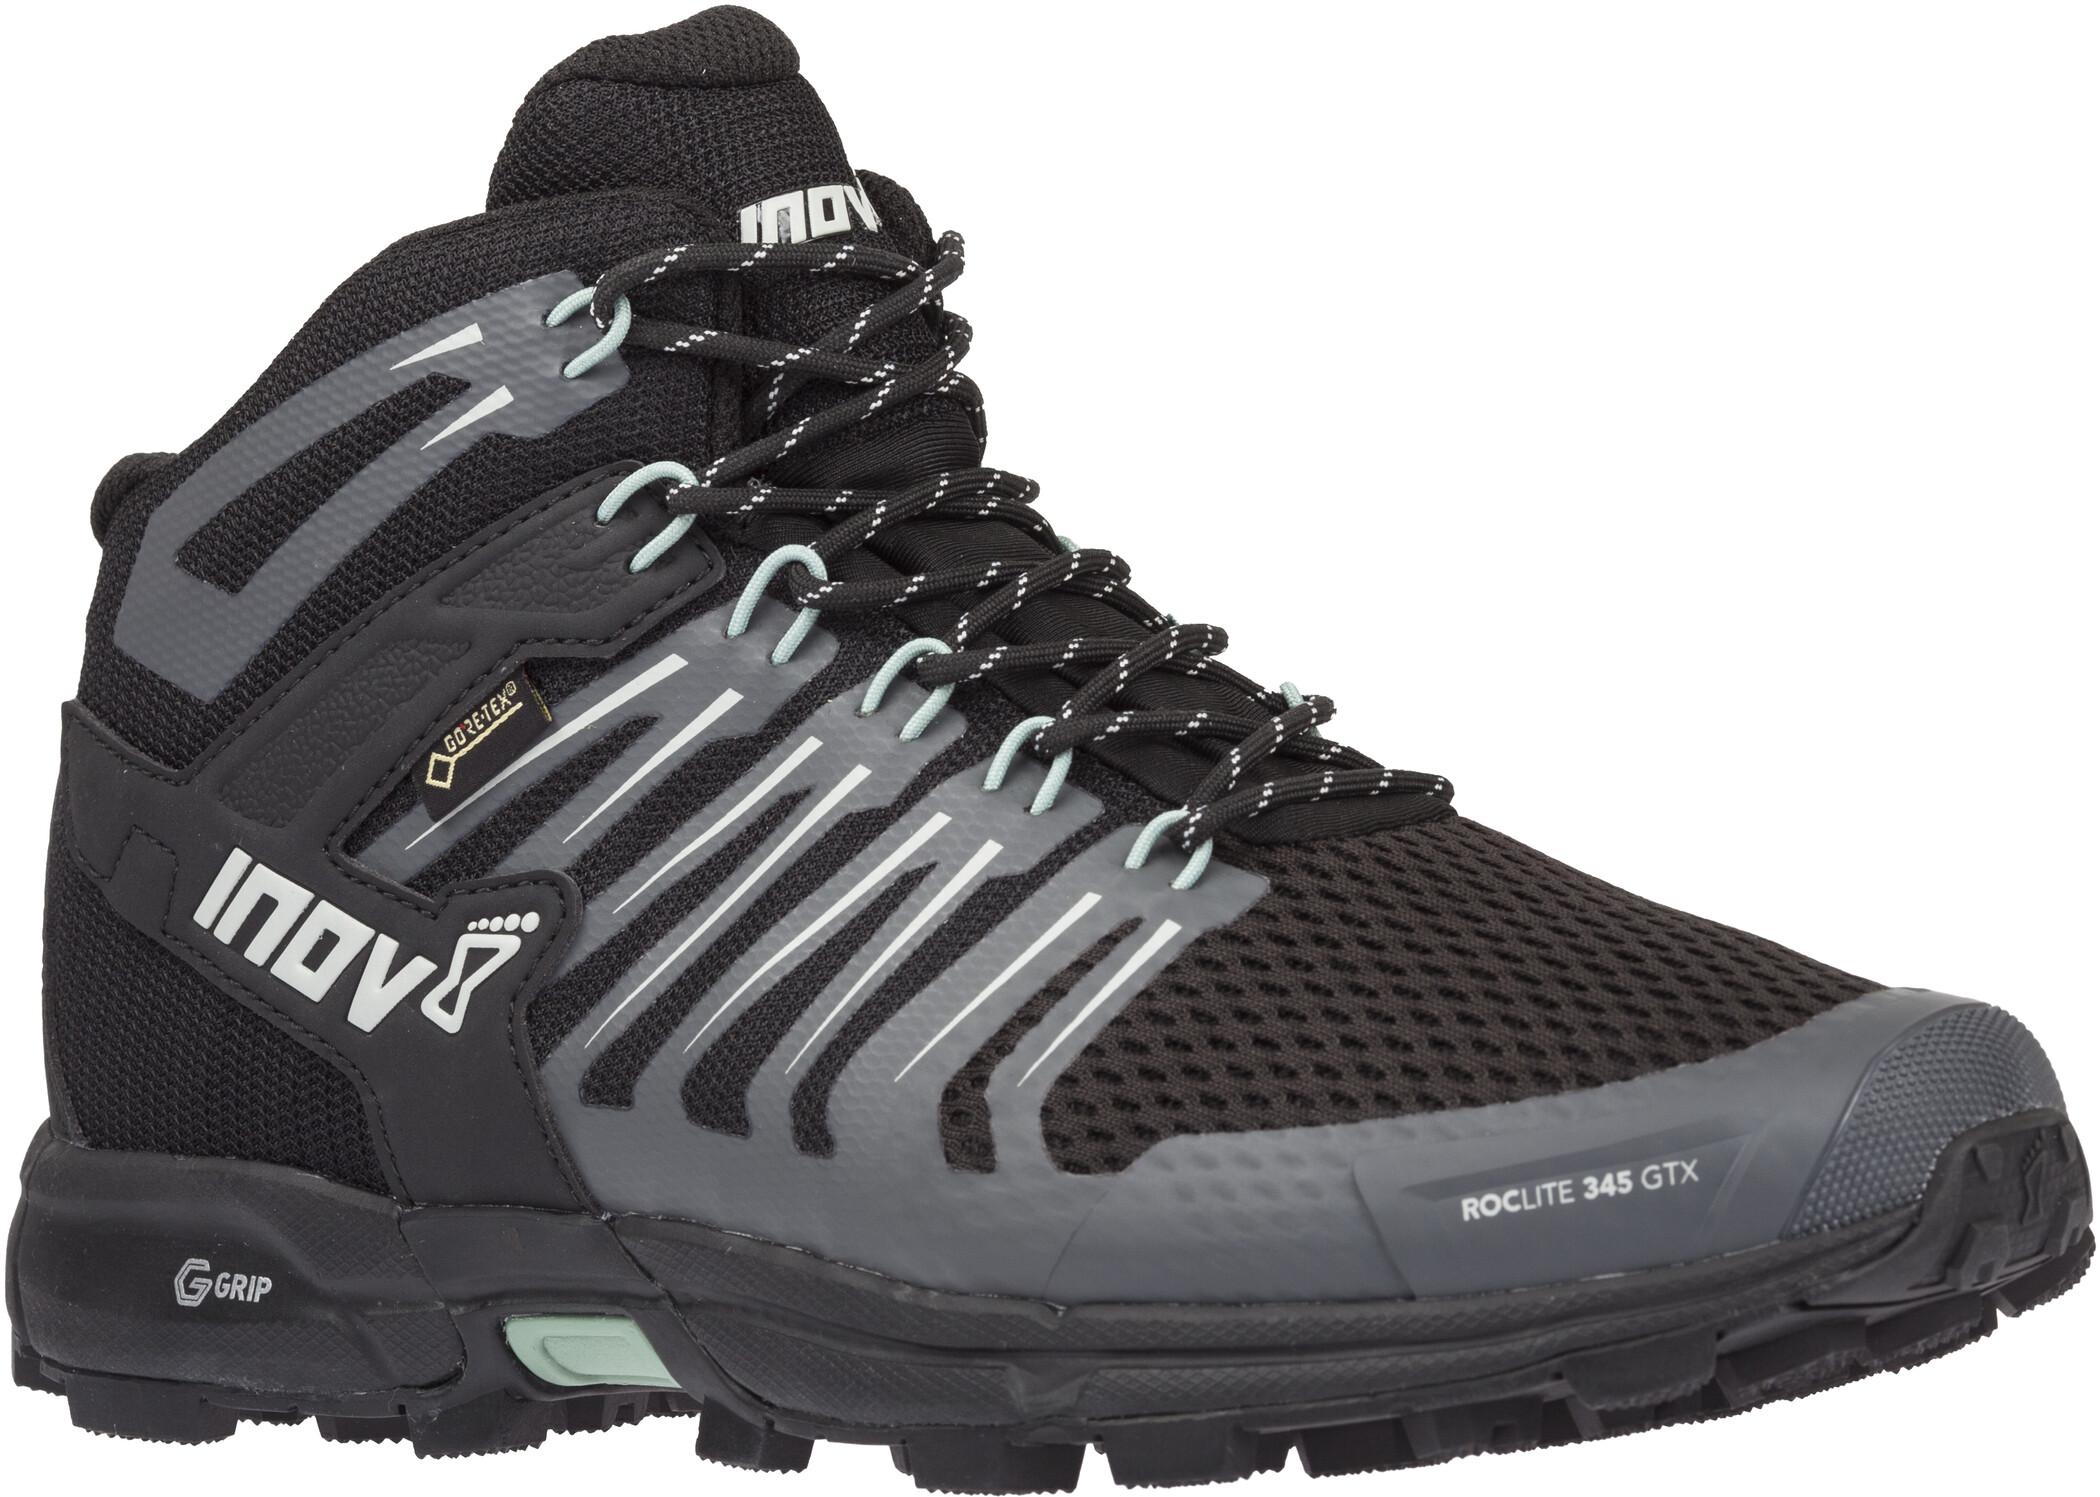 inov-8 Roclite 345 GTX Sko Damer, black/green (2019)   Shoes and overlays